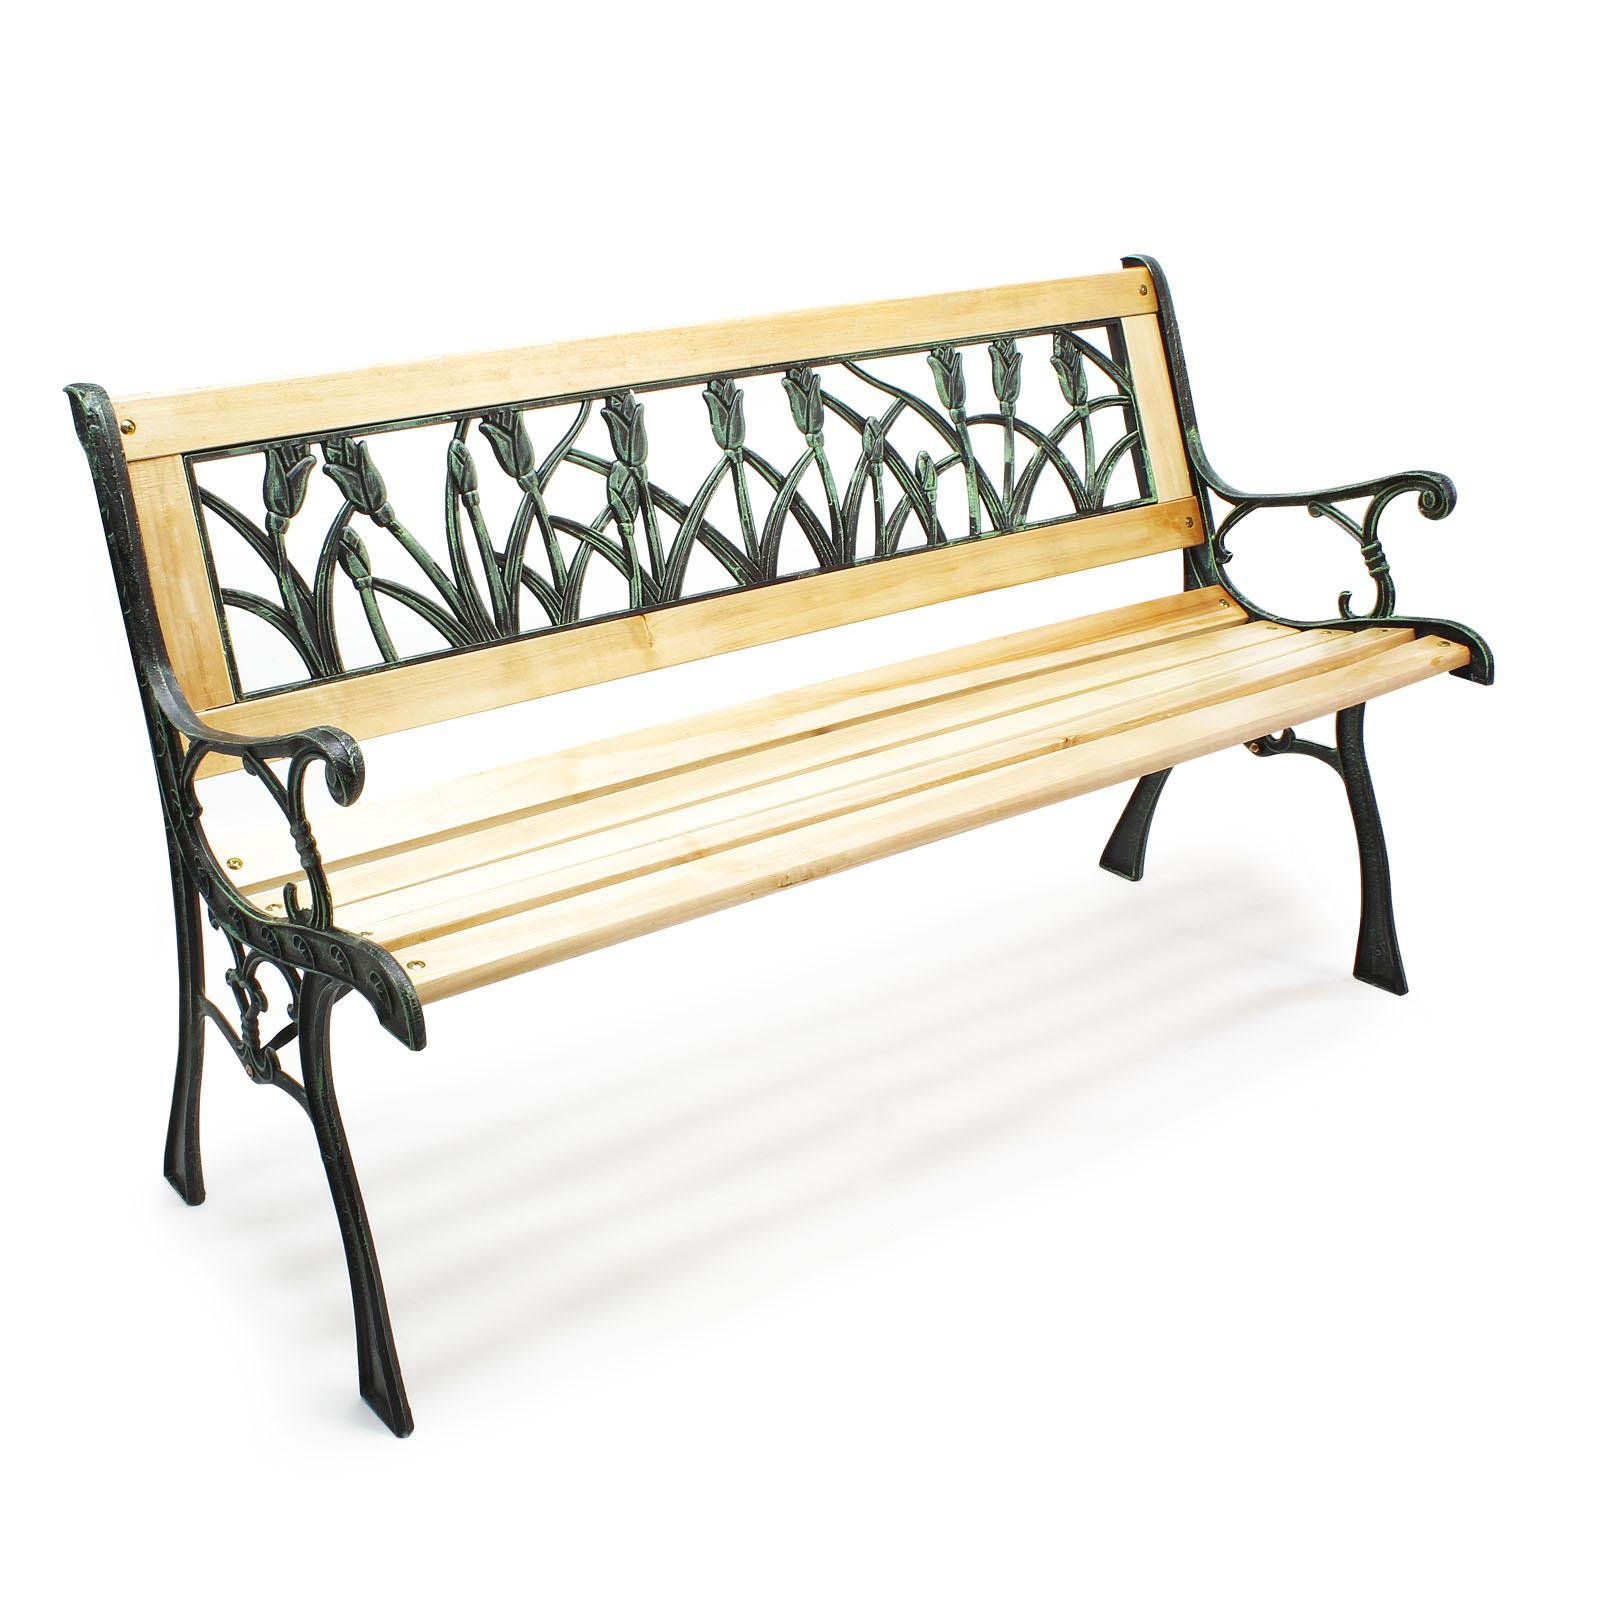 gartenbank parkbank ulrike holz gusseisen tulpendesign sitzbank zweisitzer bank ebay. Black Bedroom Furniture Sets. Home Design Ideas